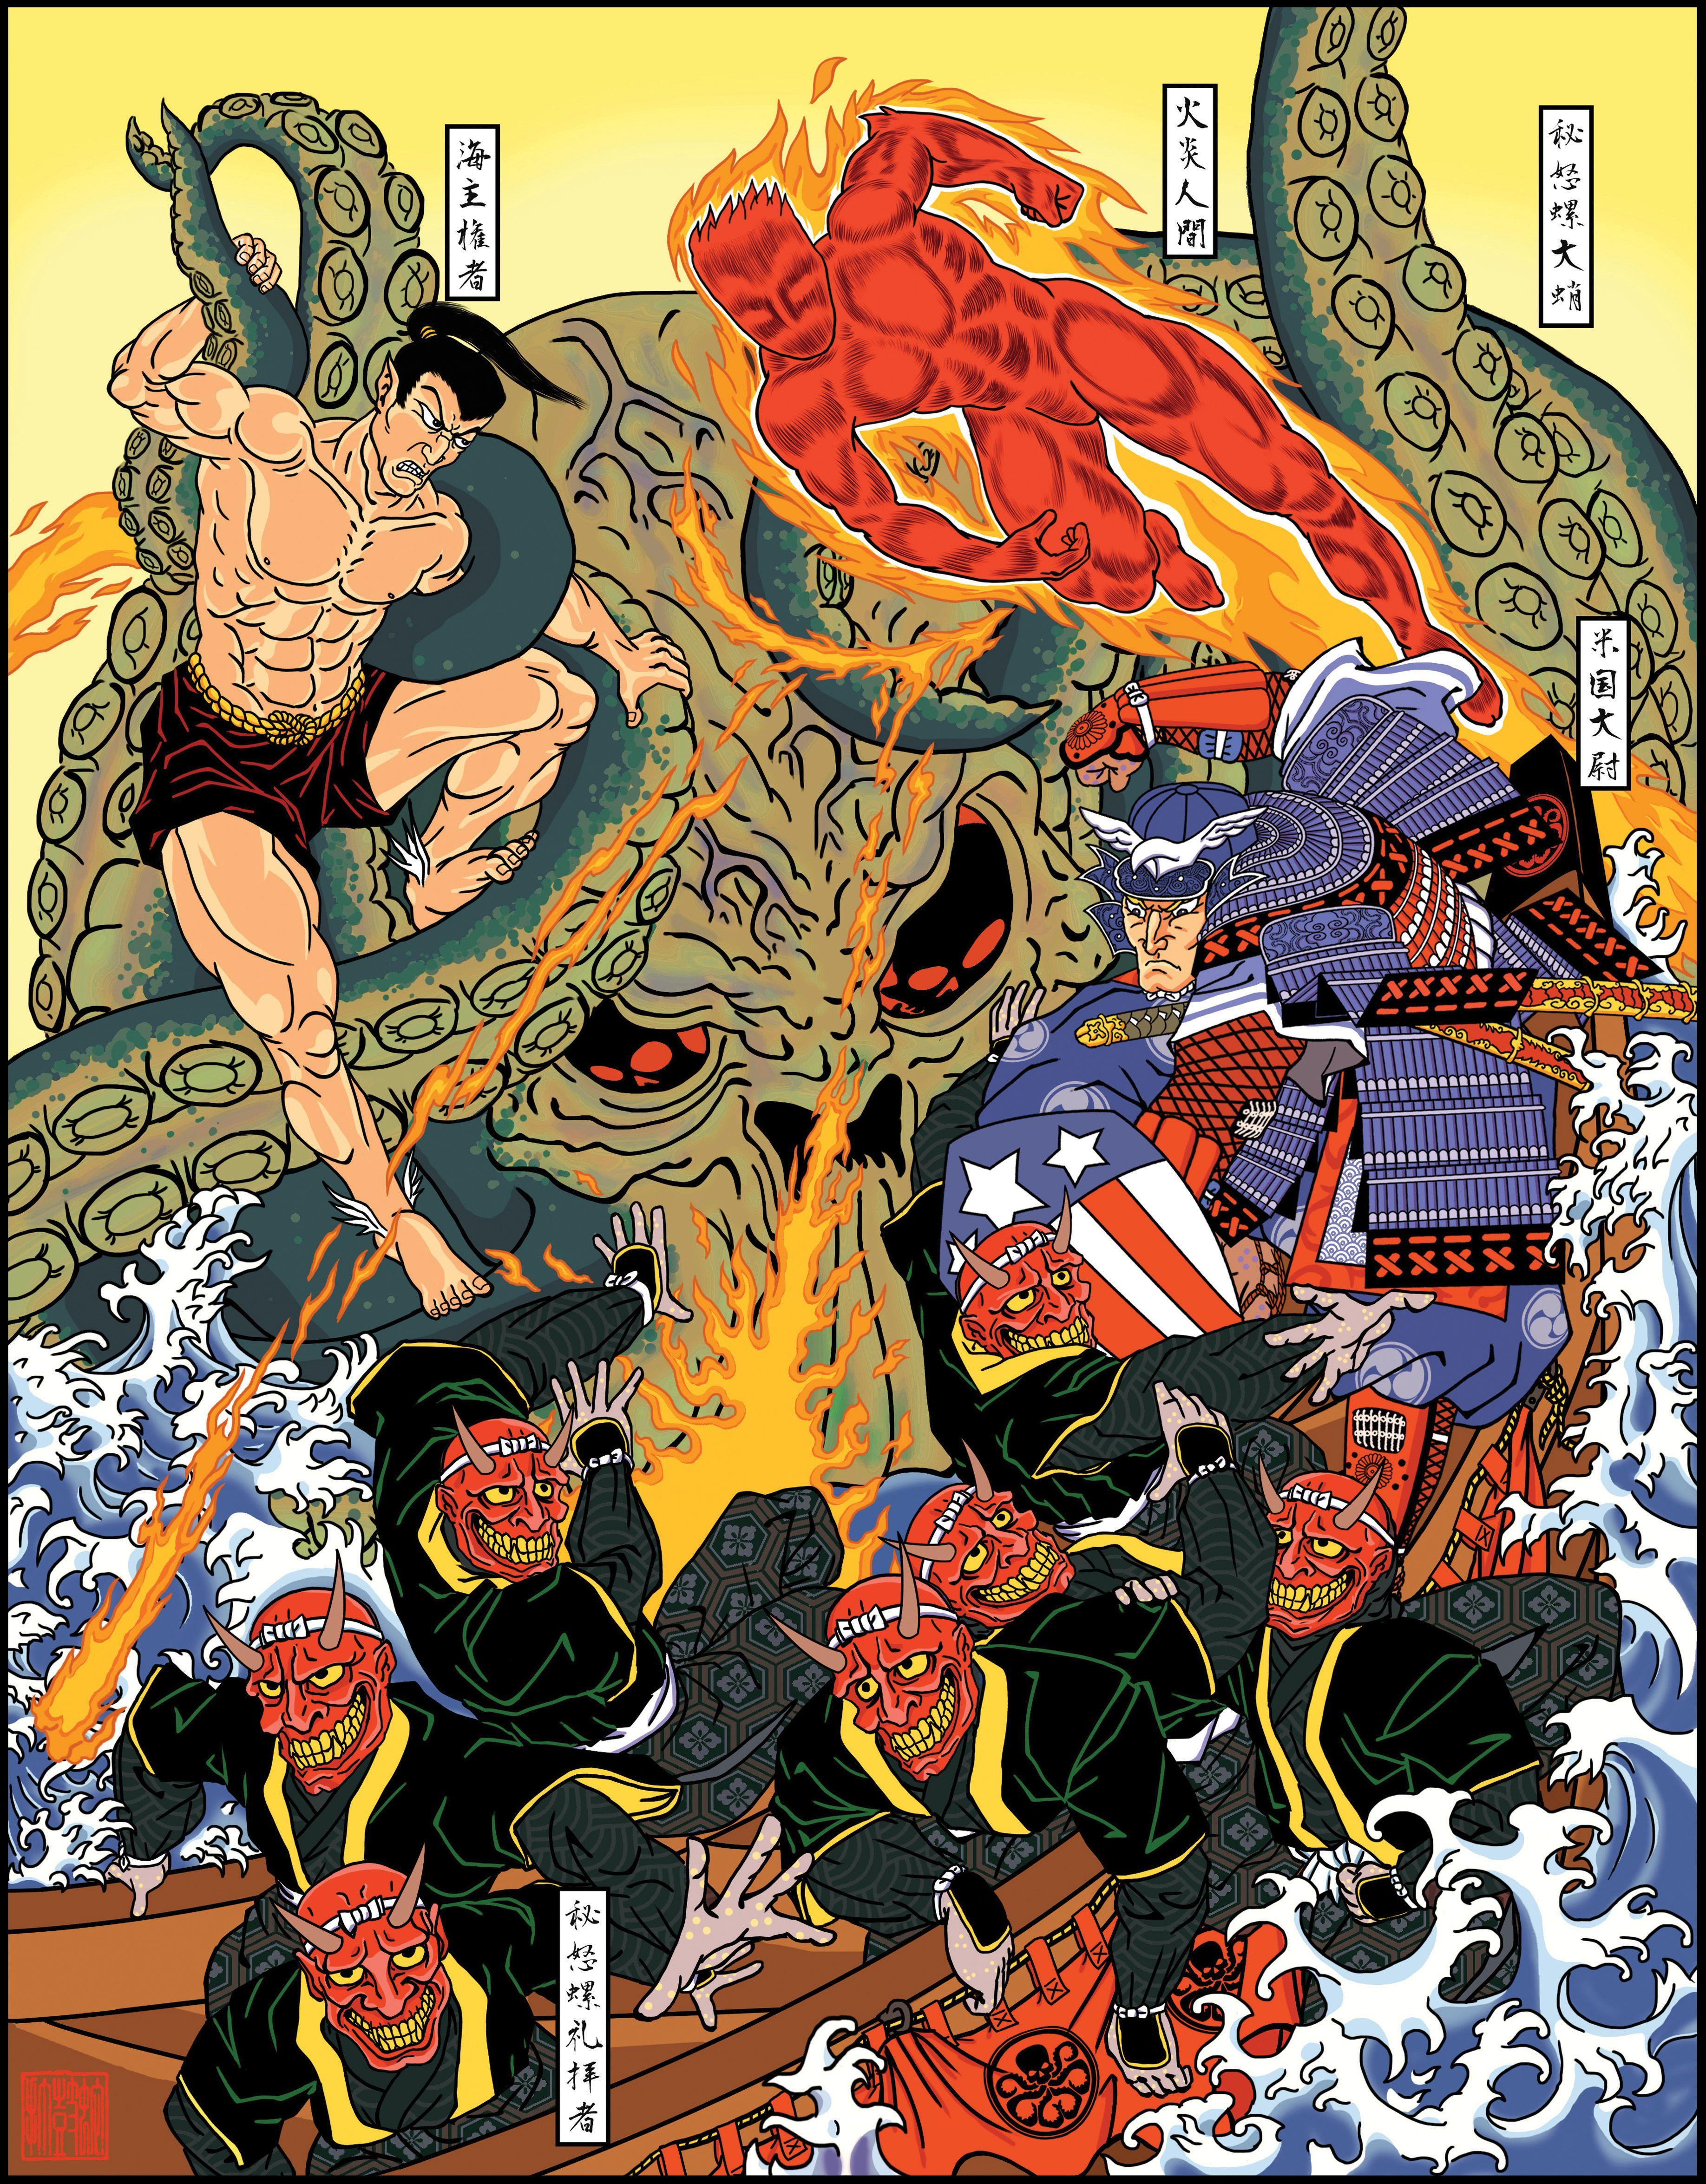 Pin by mrbryan on marvel superhero art marvel art